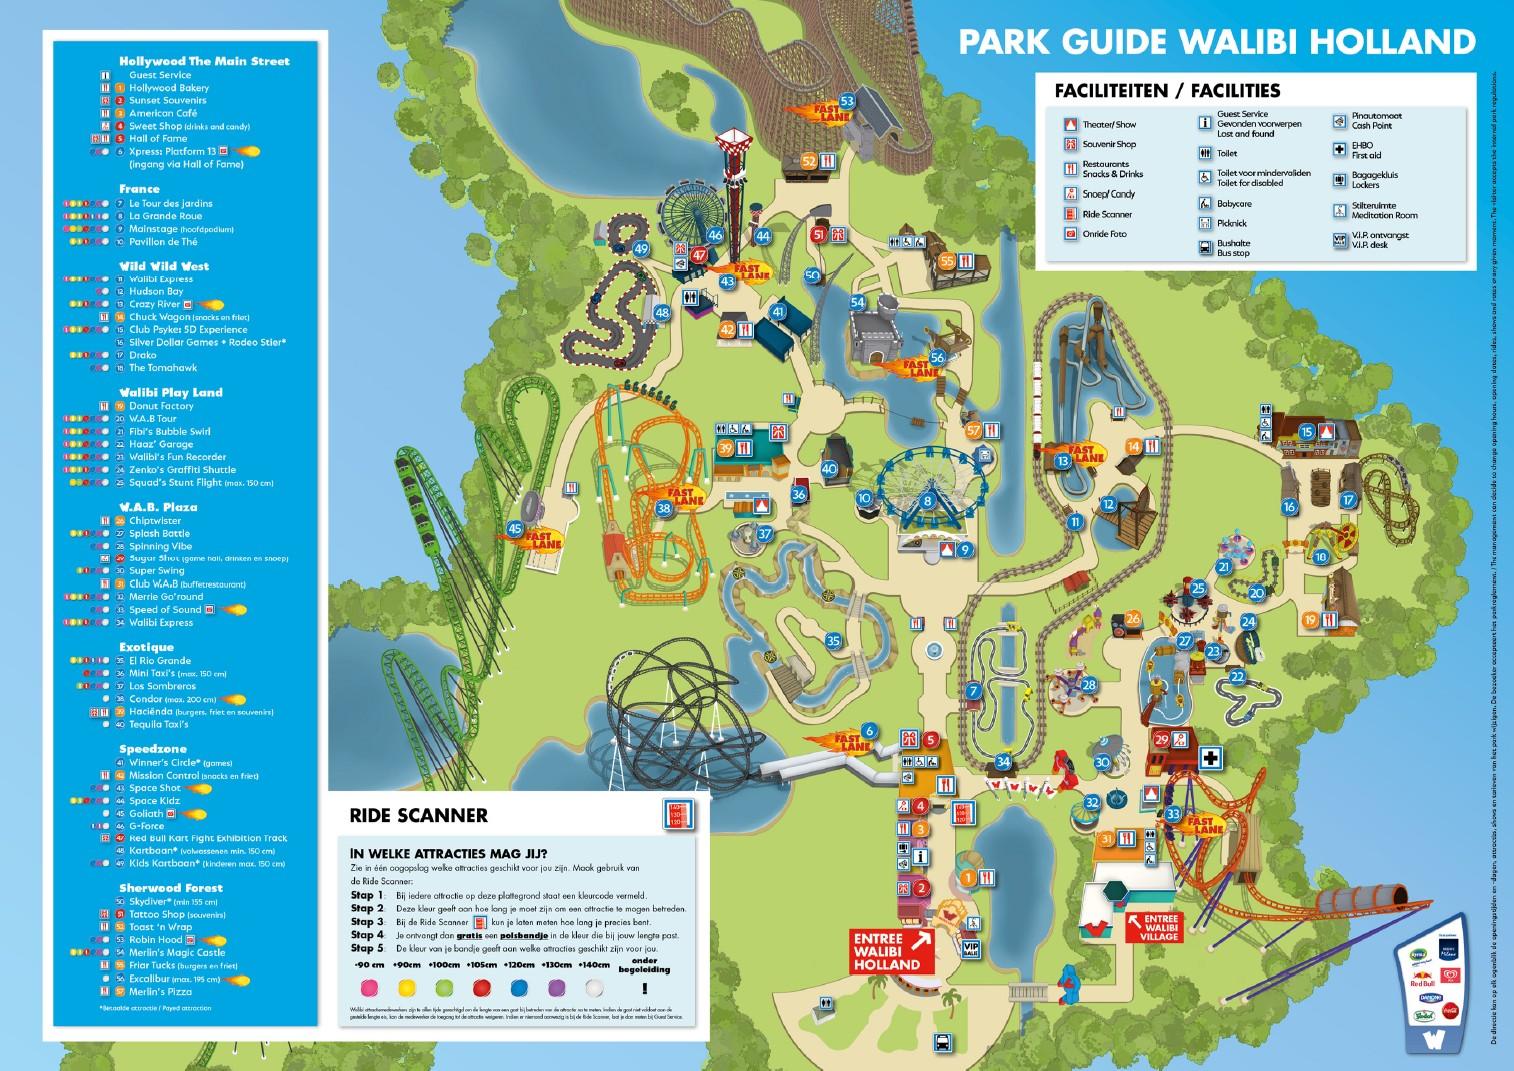 Parkmaps Parkplan Plattegrond Walibi Holland Freizeitpark